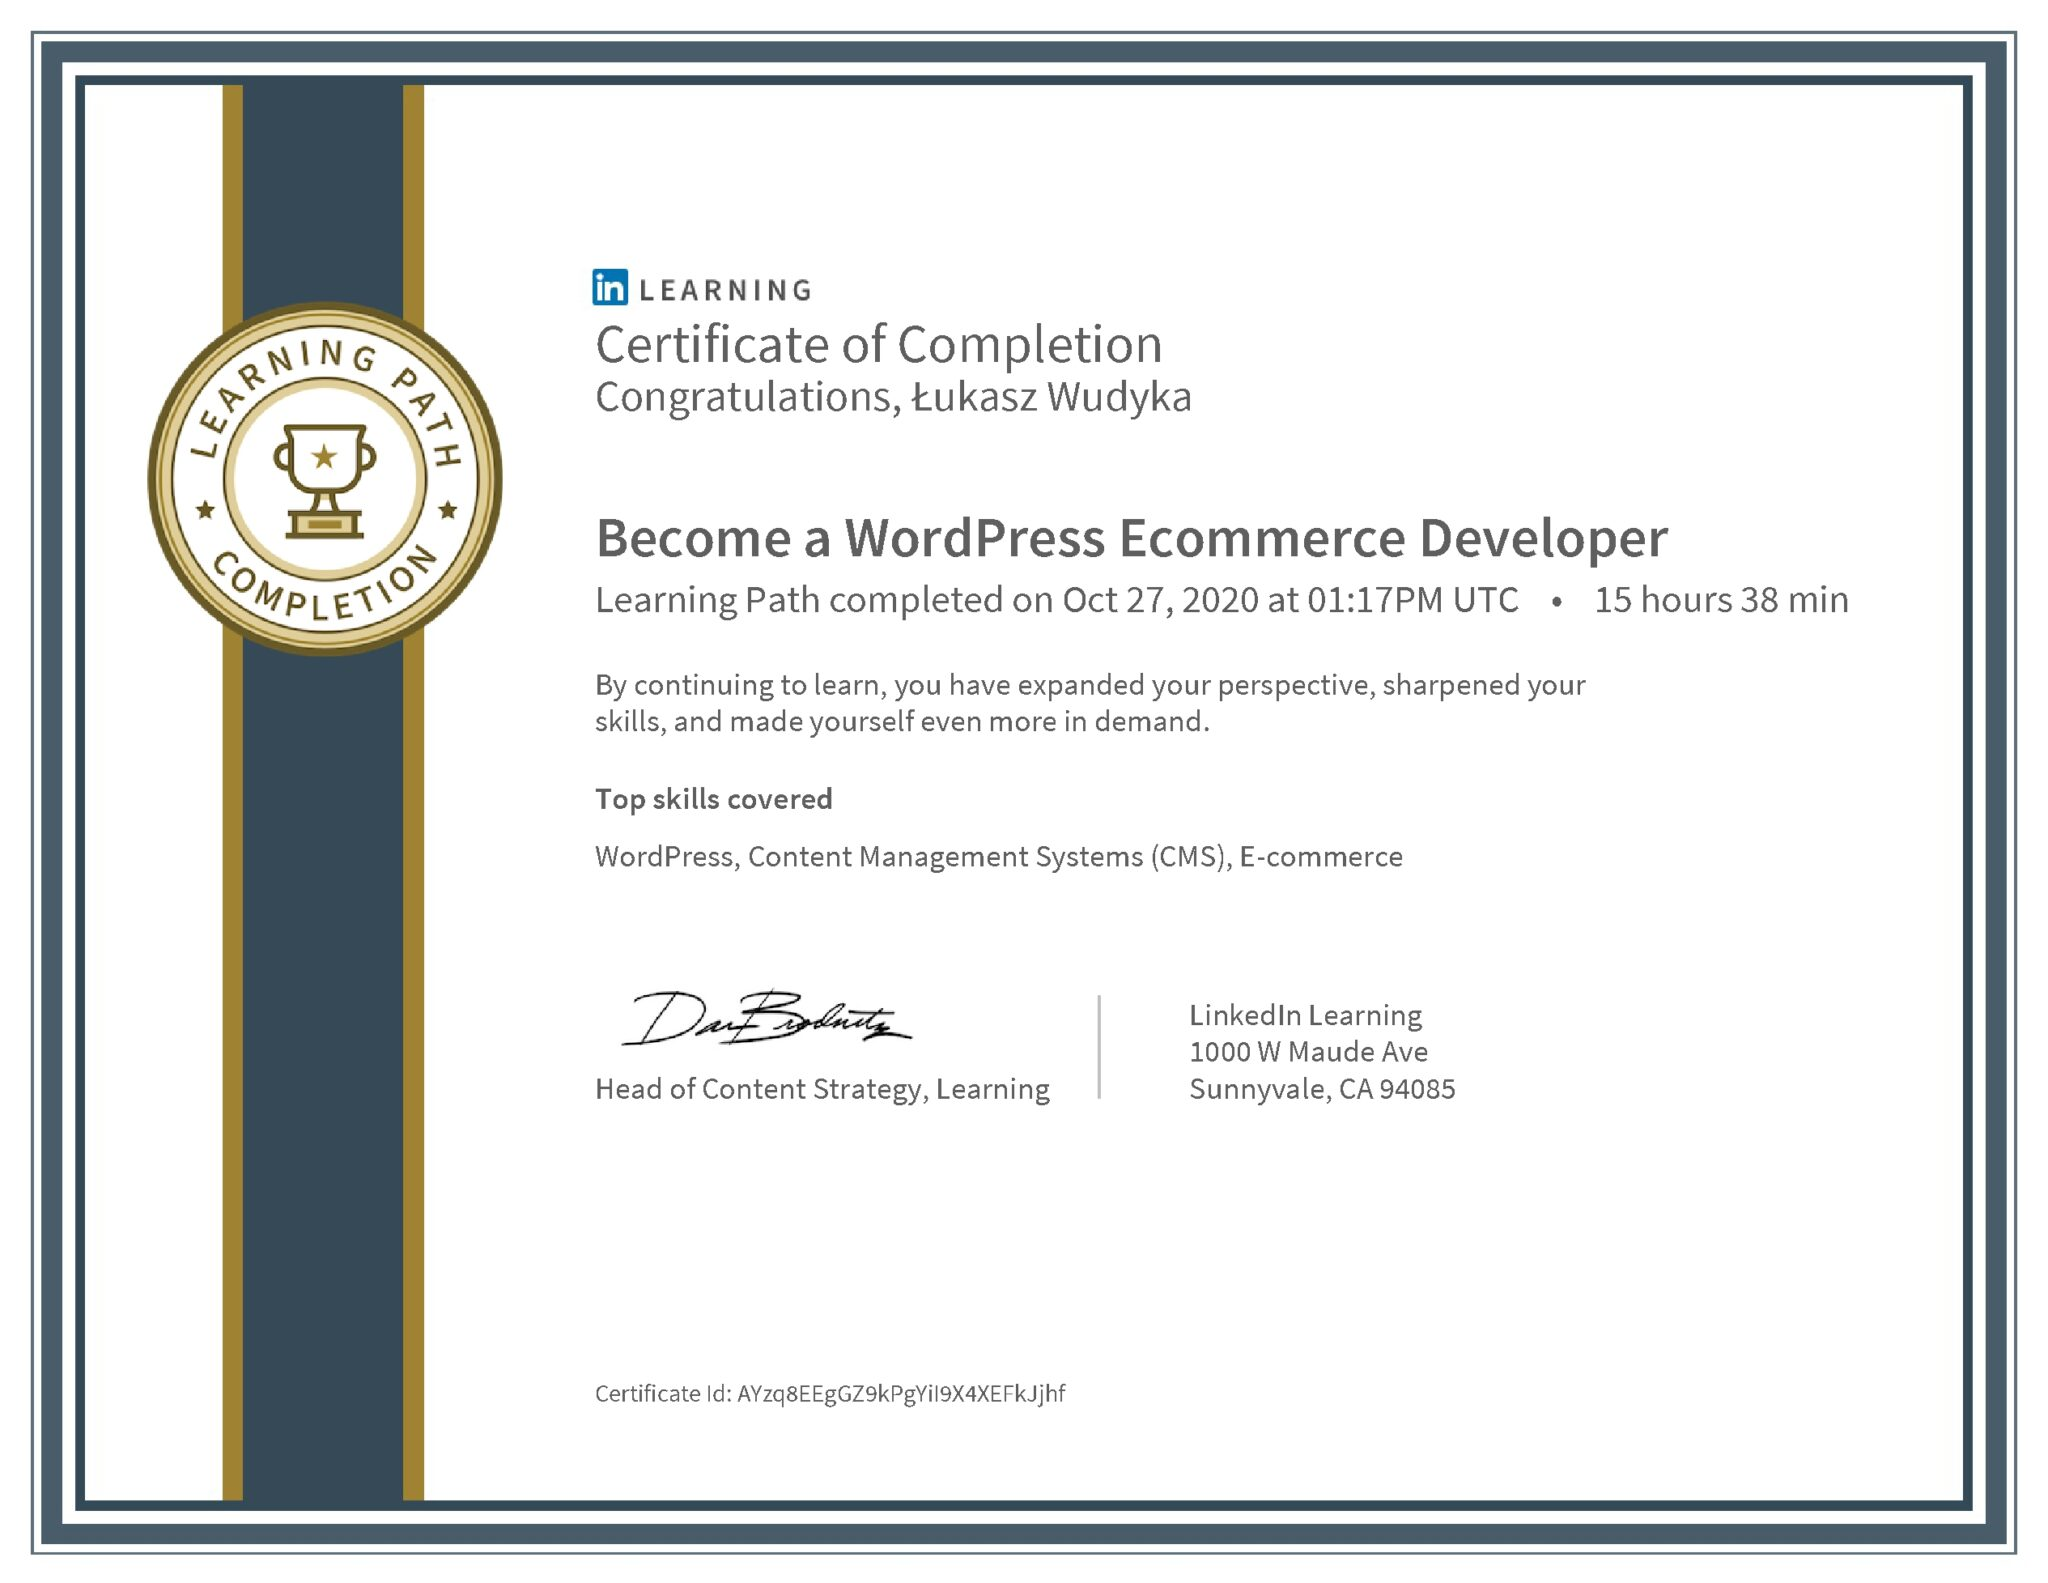 Łukasz Wudyka certyfikat LinkedIn Become a WordPress Ecommerce Developer